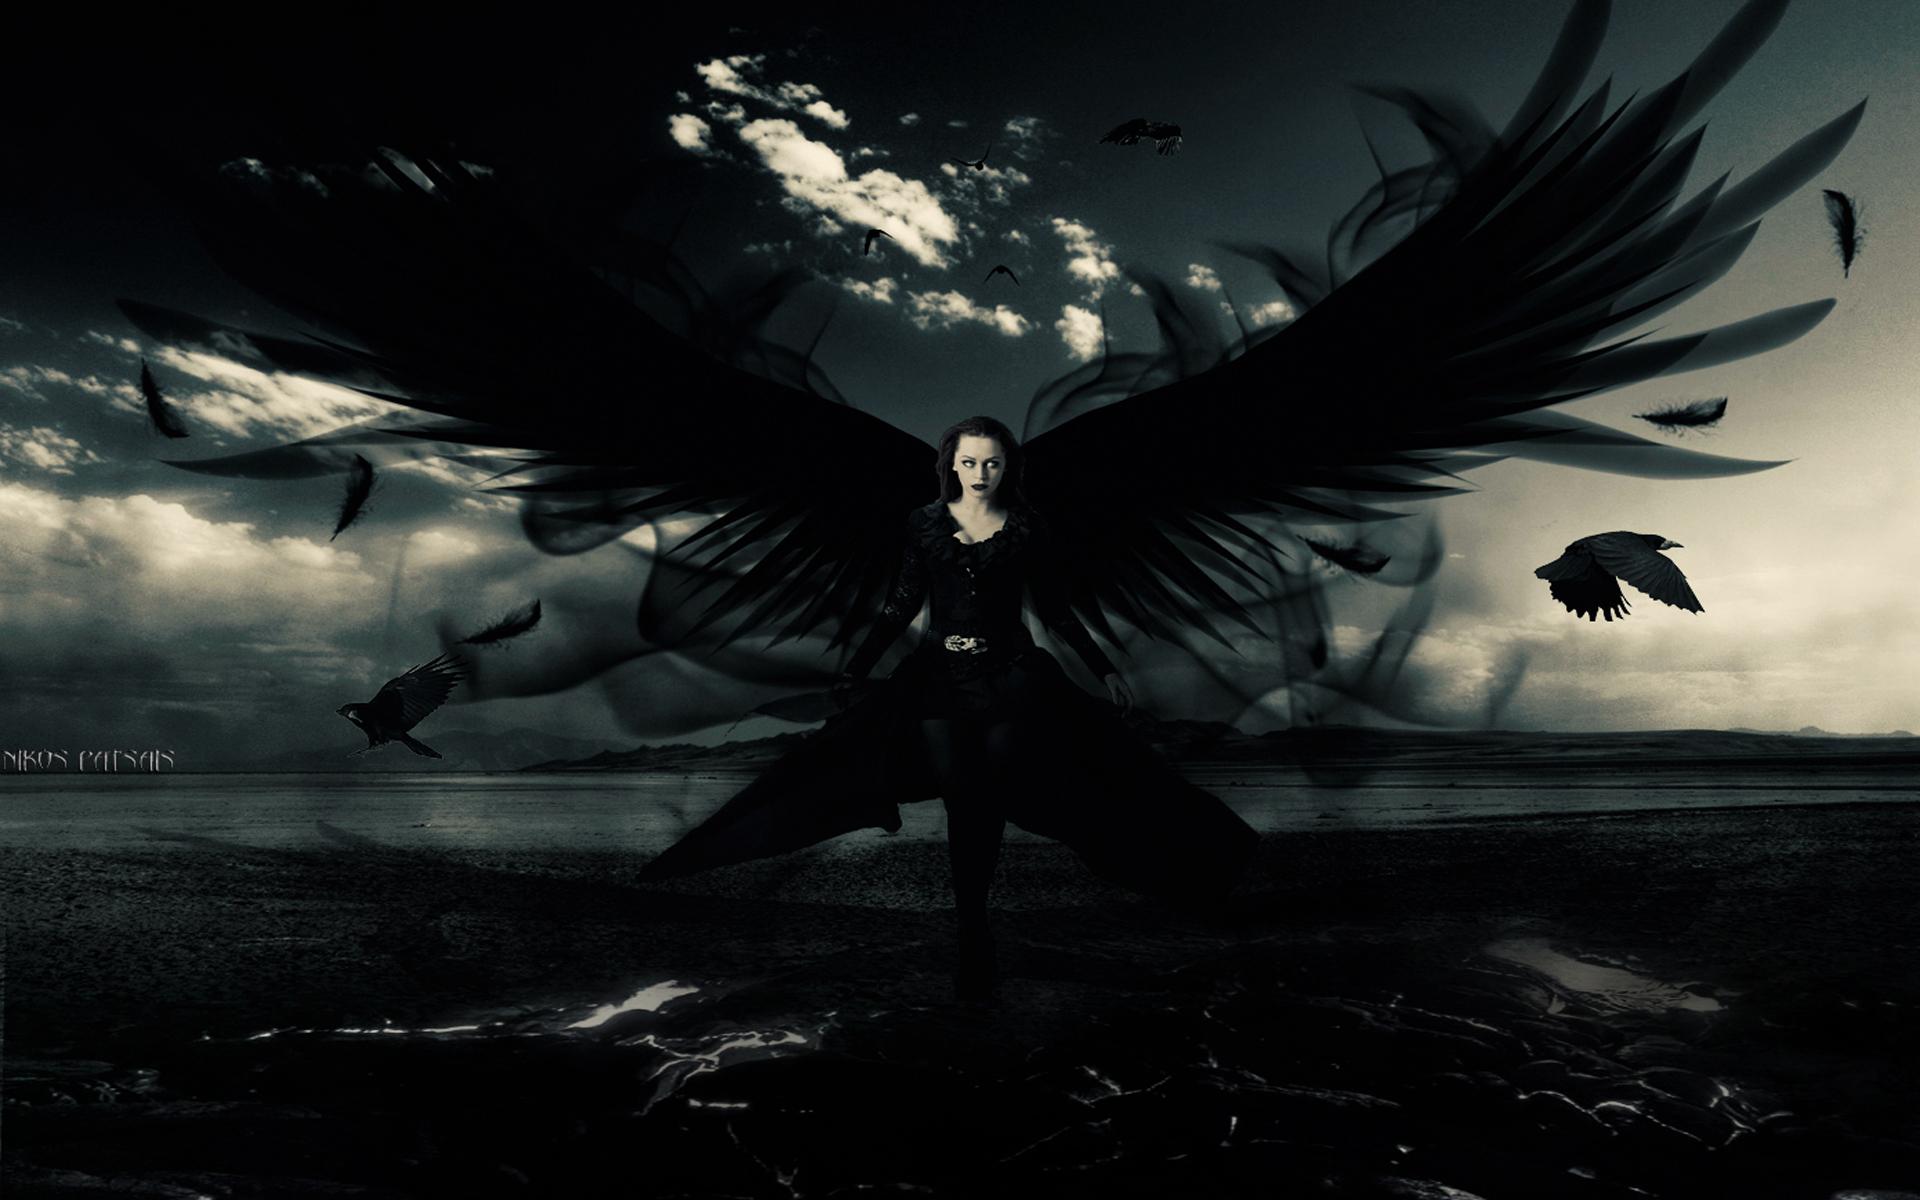 Dark Angel Anime Hd Wallpaper 1920x1200